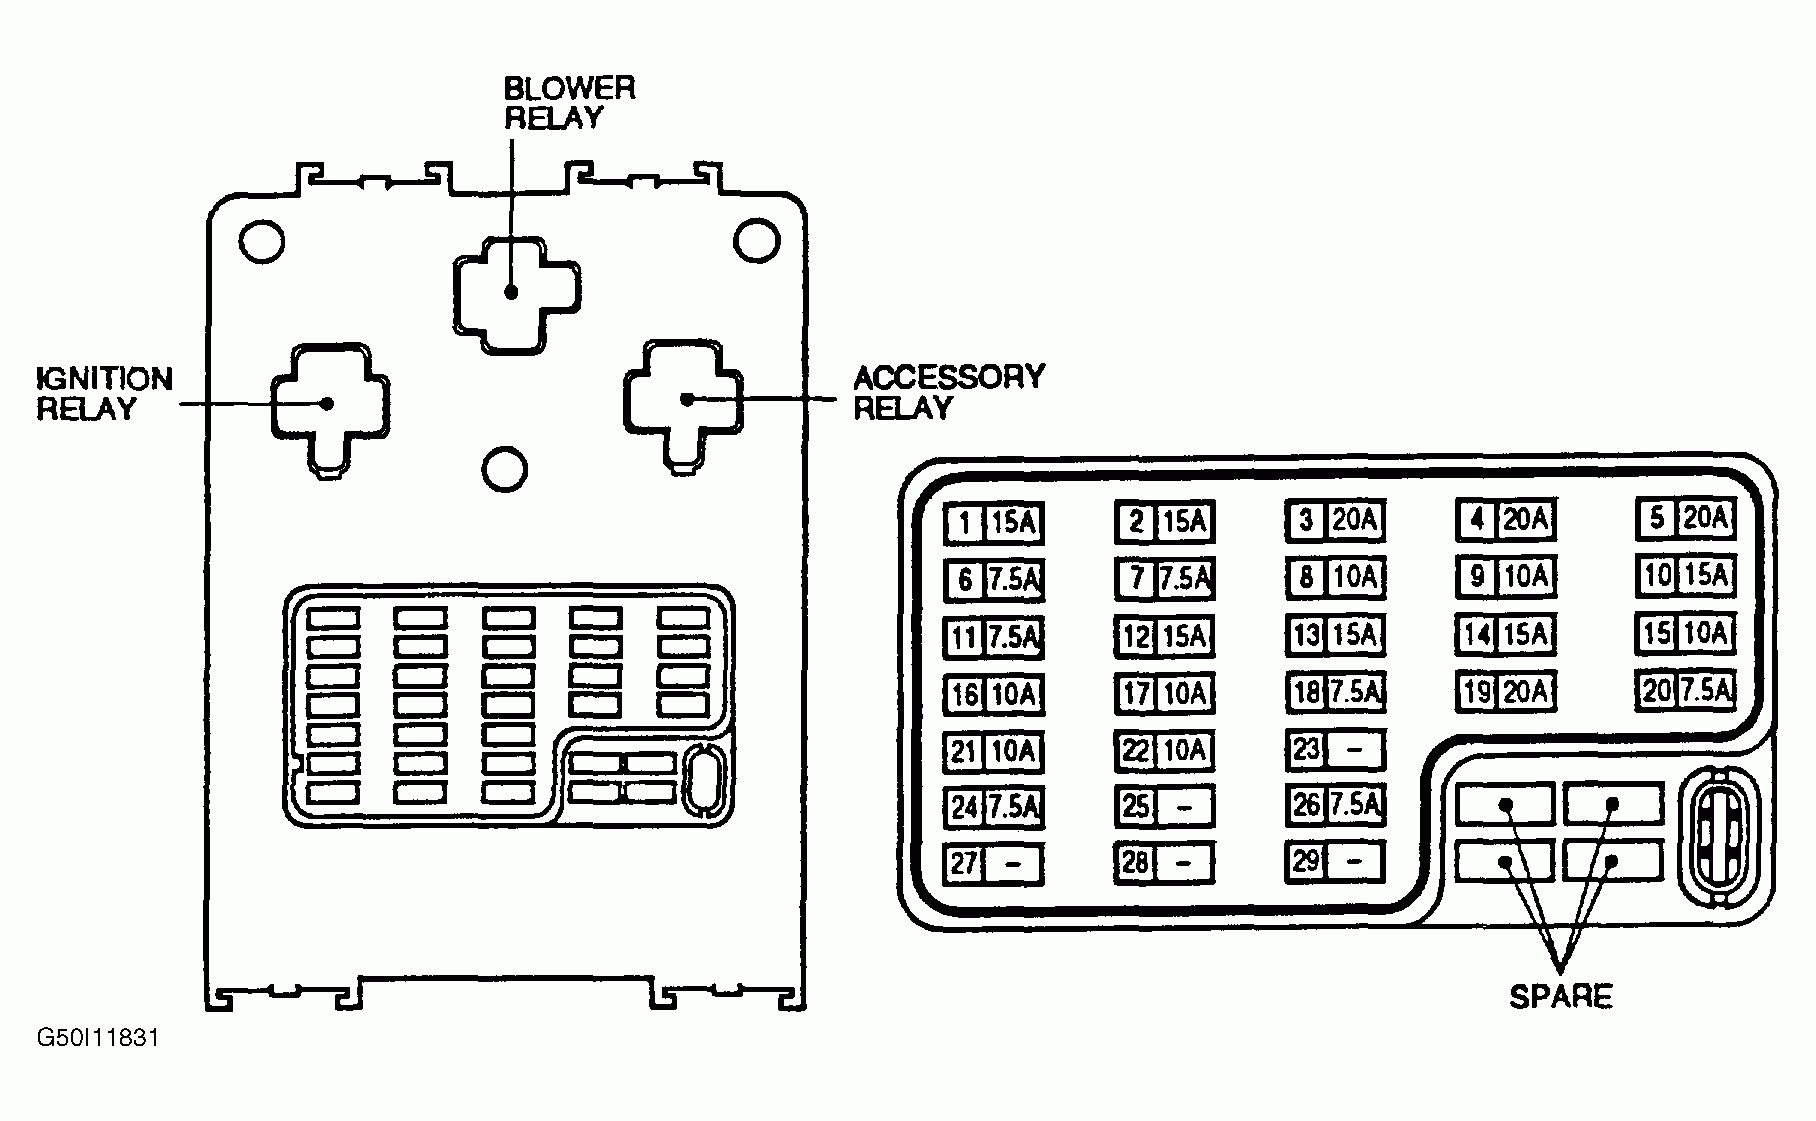 [CSDW_4250]   Fuse Box 1999 Altima 6 Pair Telephone Wiring Diagram -  honda.95ri.the-rocks.it | Fuse Box 1999 Nissan Altima |  | Bege Wiring Diagram Source Full Edition